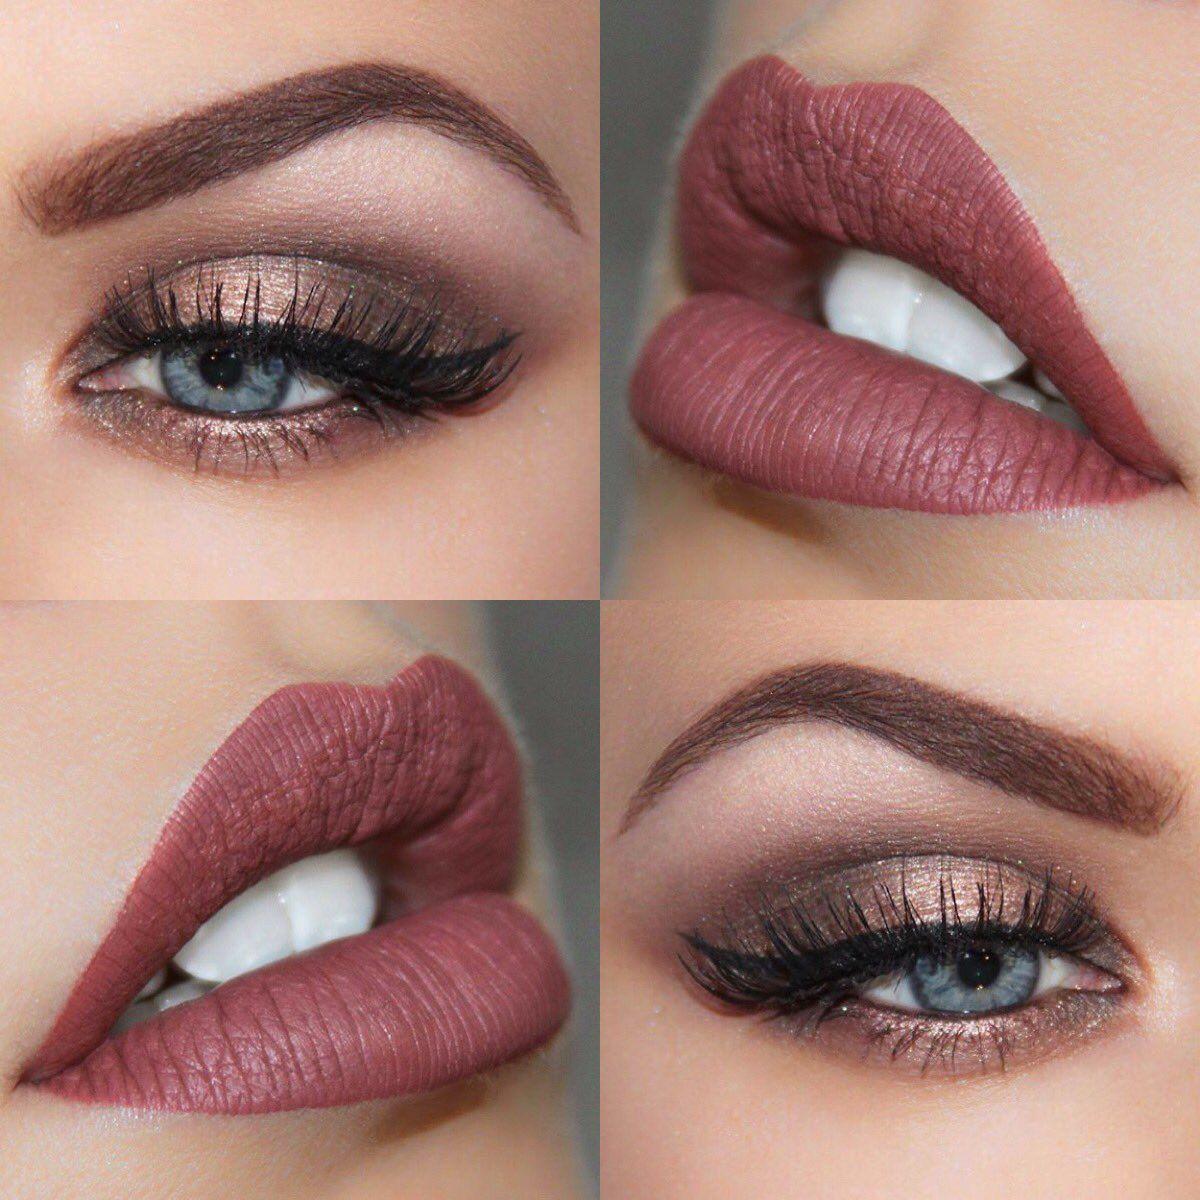 """Autumn awesomeness using @ABHcosmetics Allison liquid lipstick and Modern Renaissance palette @norvina1 #AnastasiaBeverlyHills"""